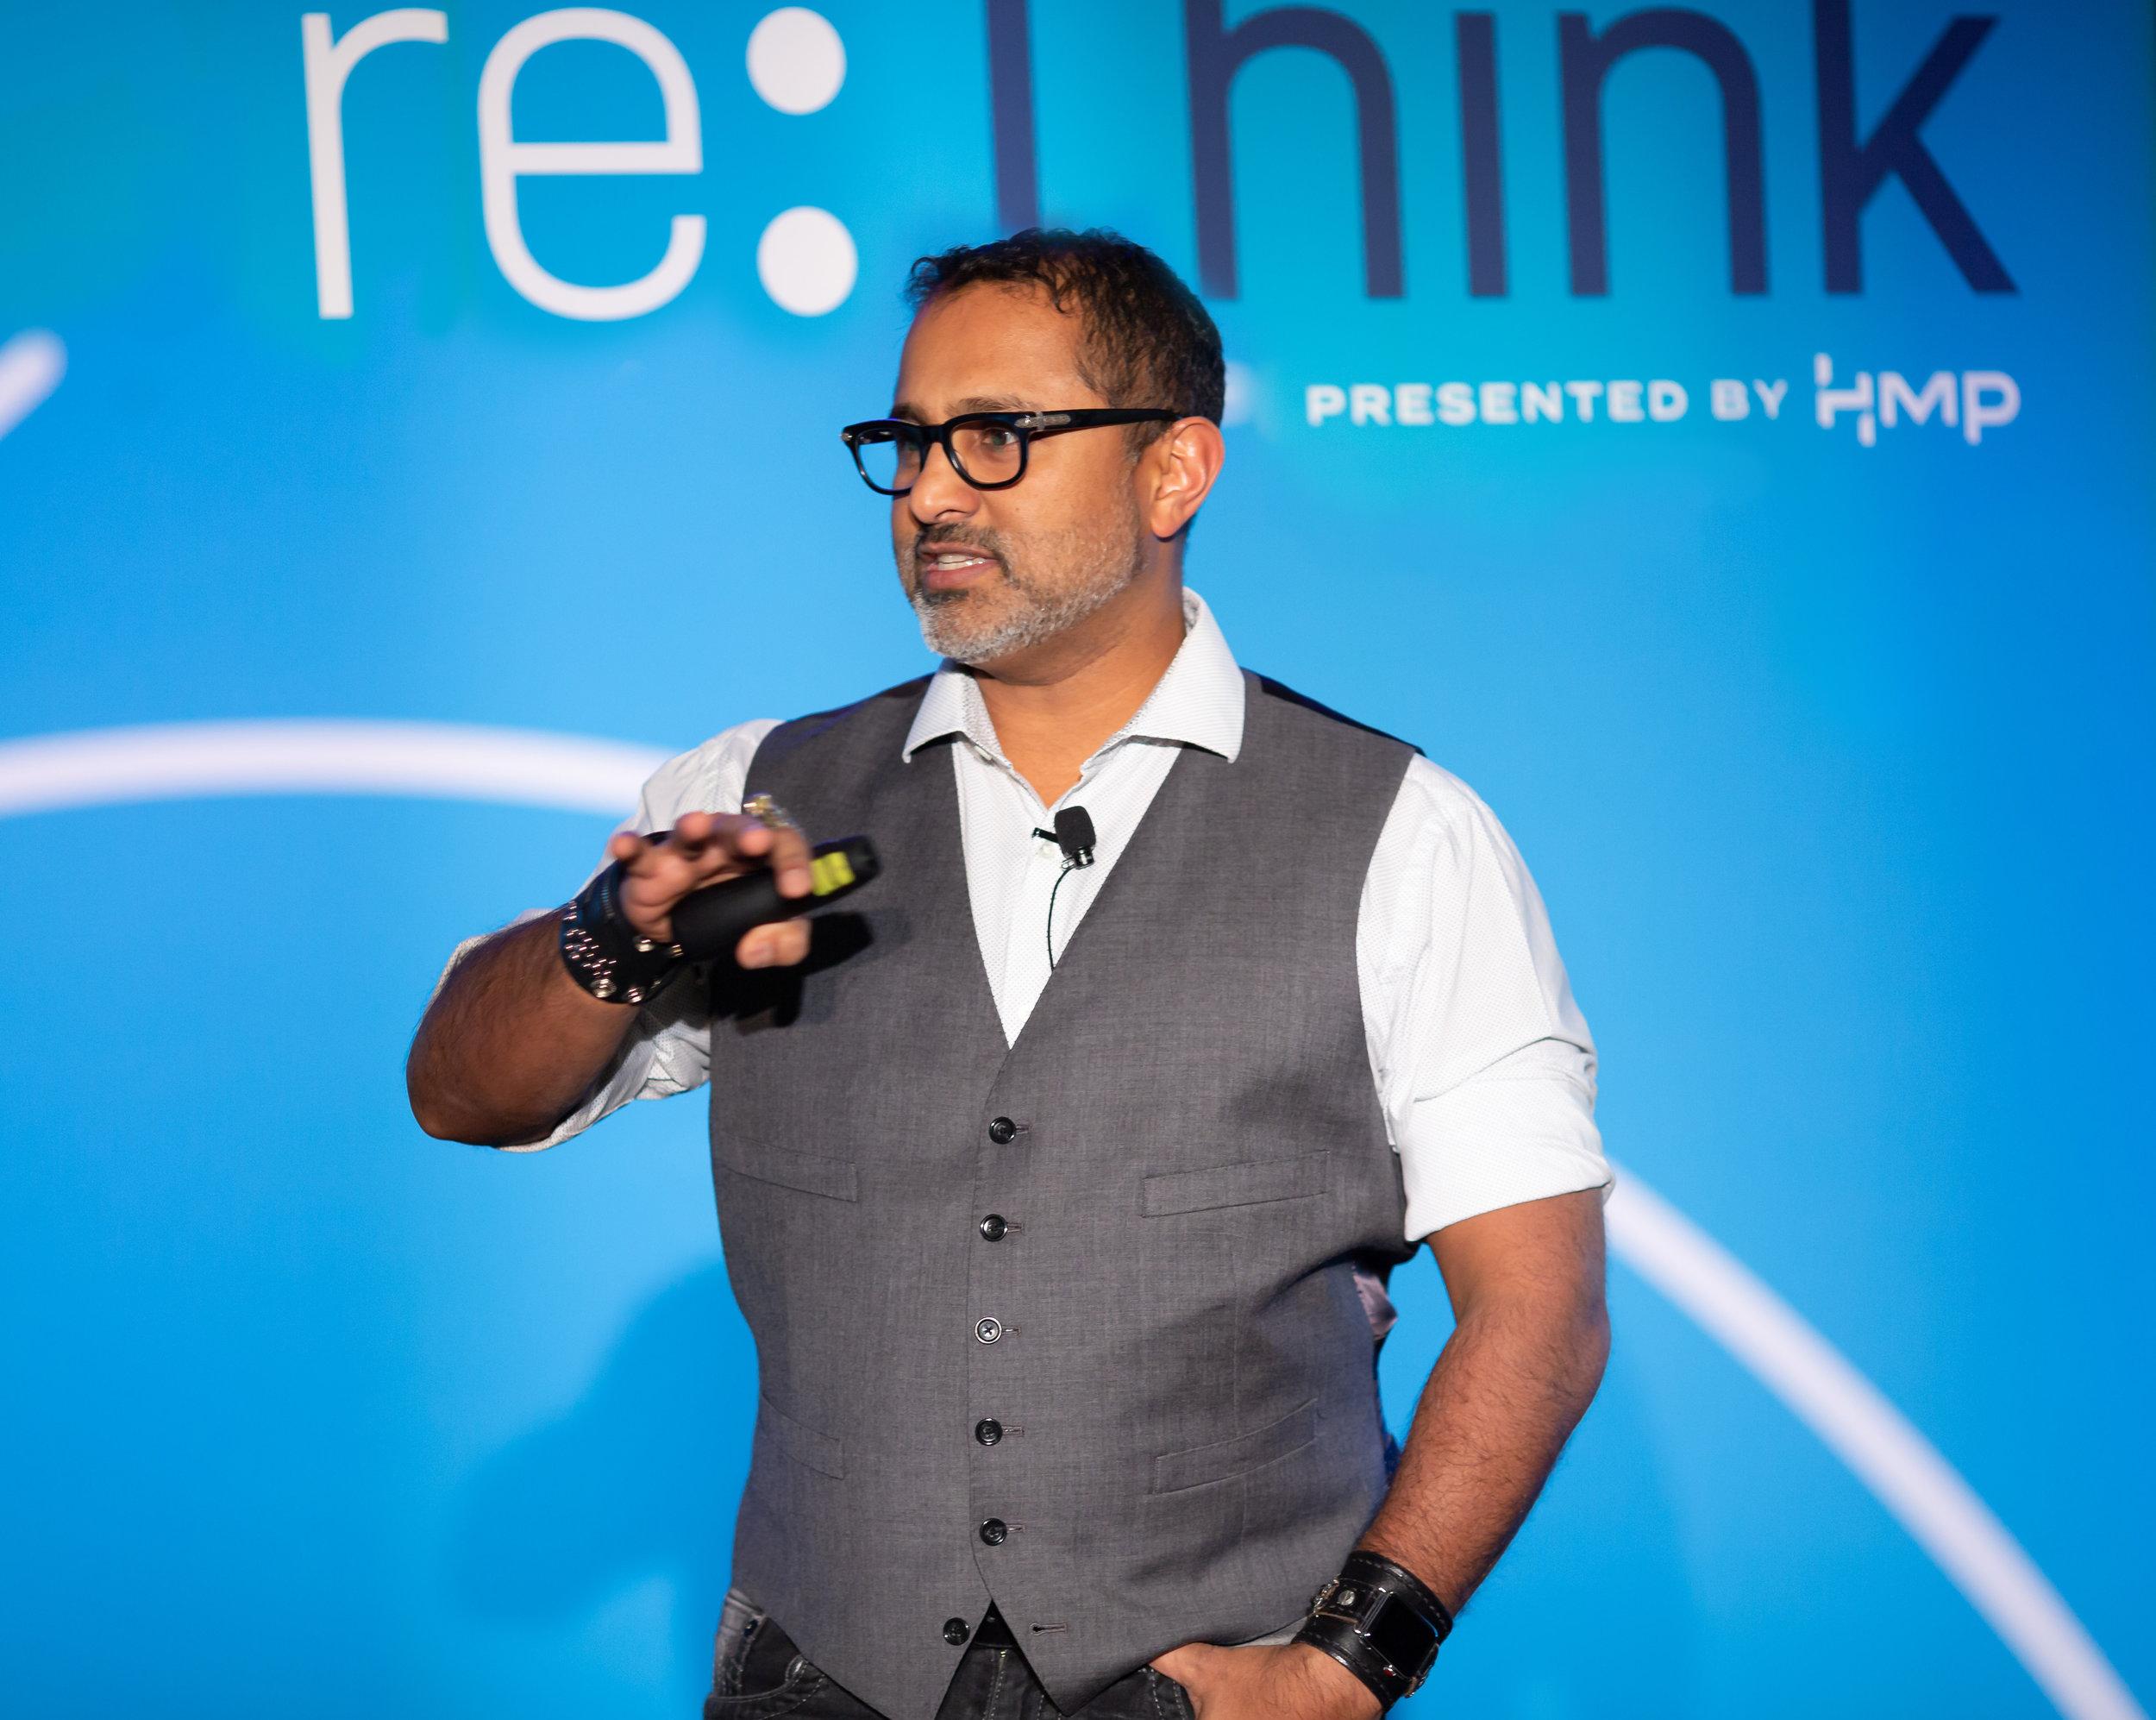 inspiring Keynotes -